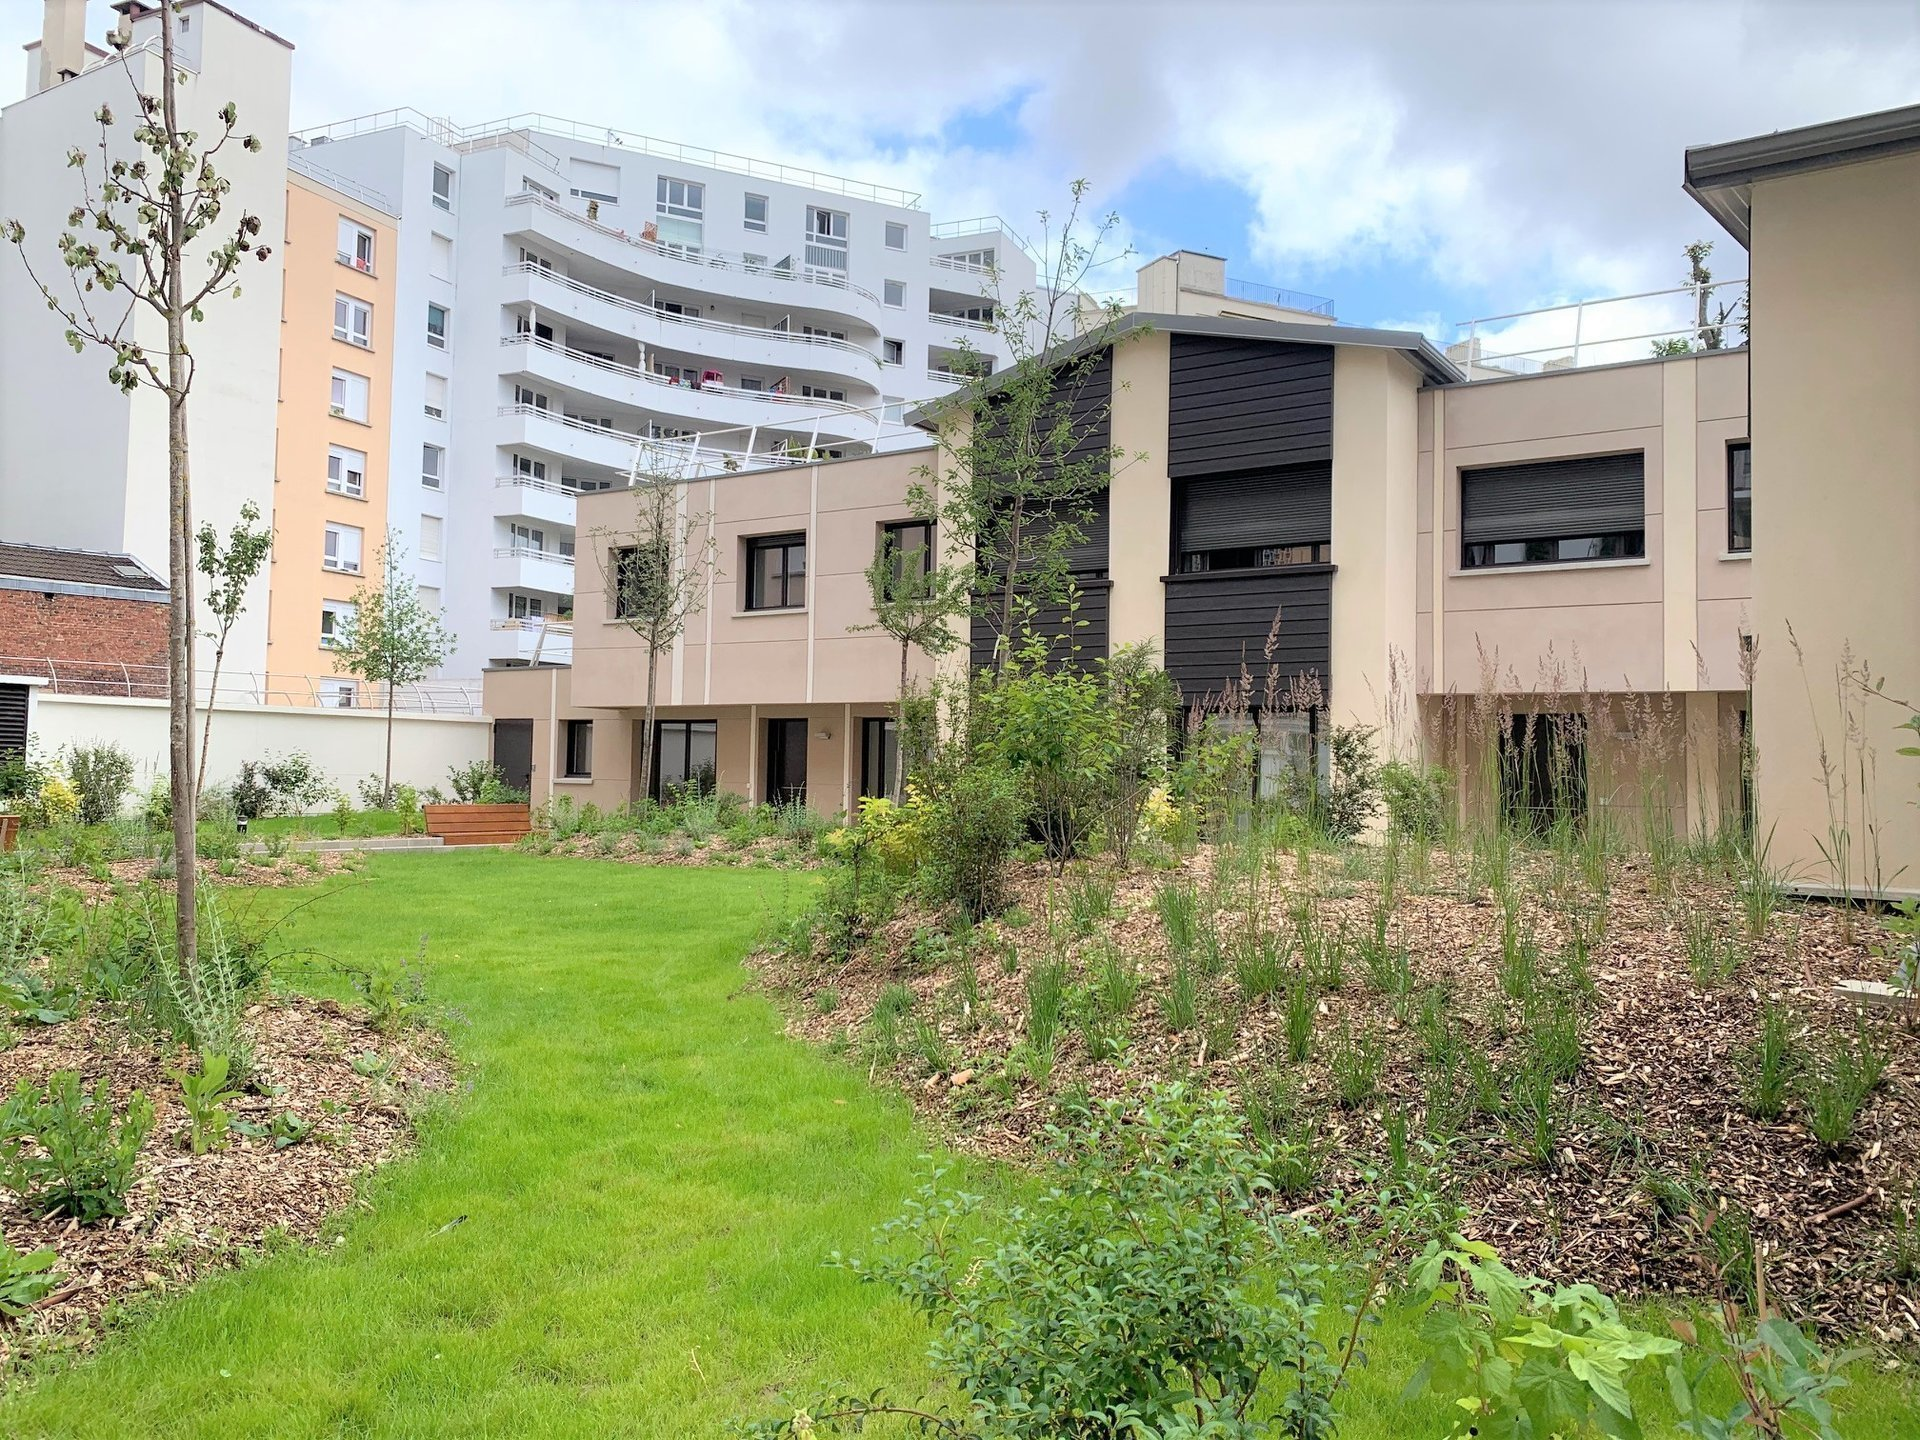 Boulogne Billancourt - 92100 - Marcel Sembat